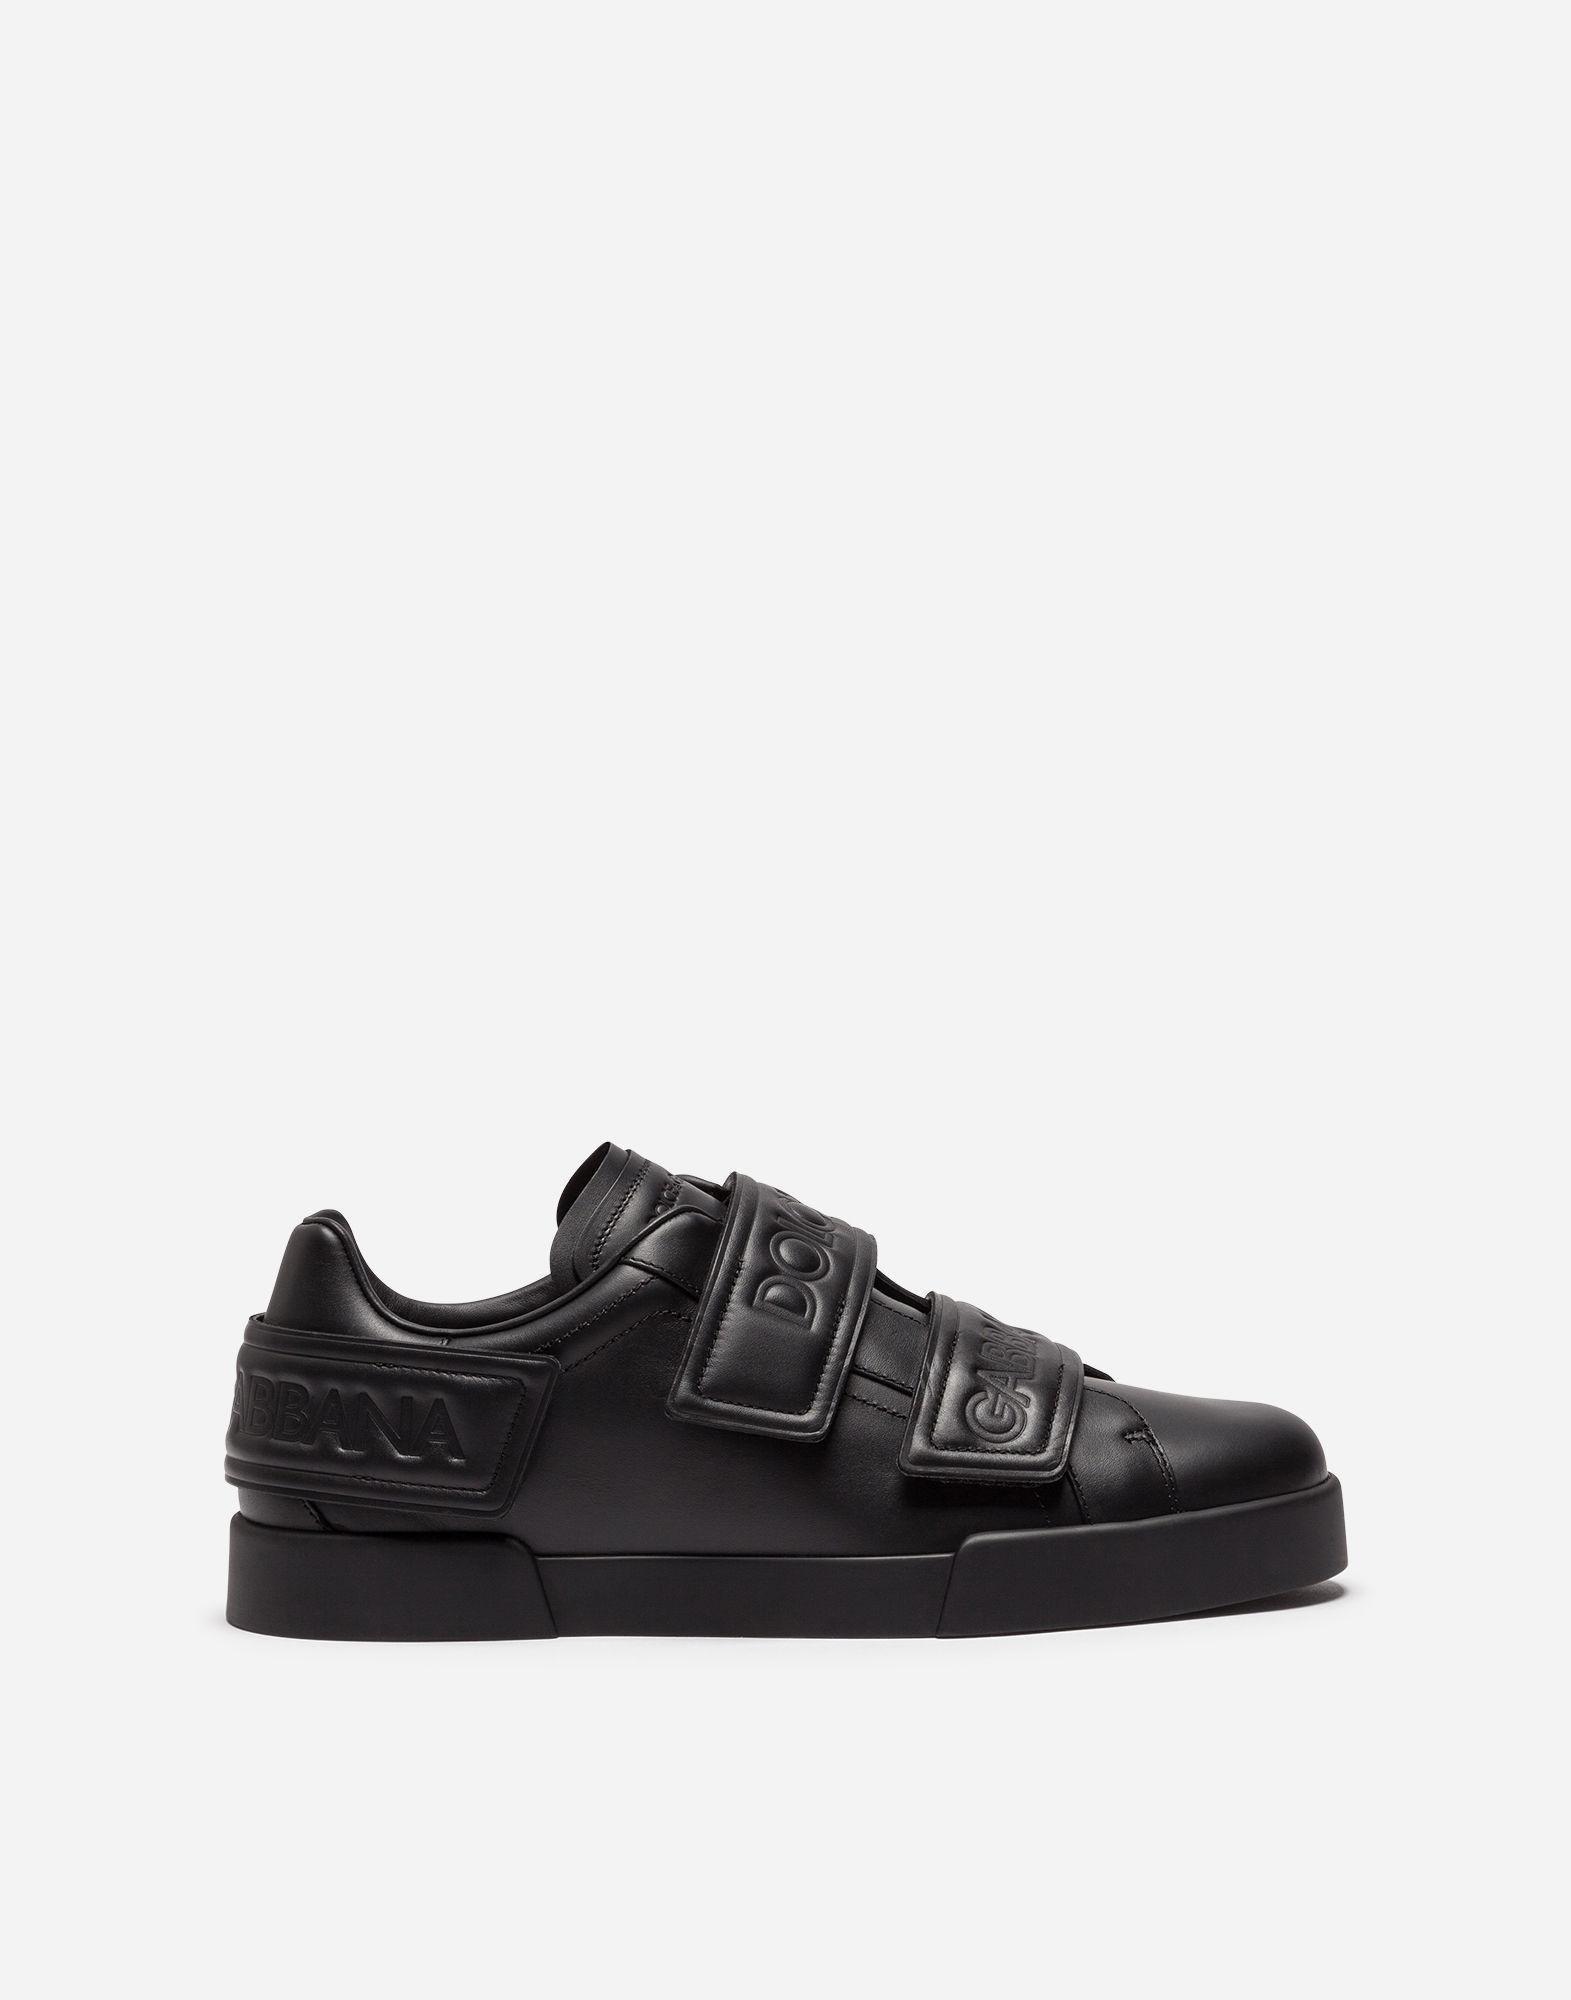 Sneaker PORT LIGHT calfskin Logo black silver white Dolce & Gabbana Fashionable Sale Online Cheap Shop Offer xnGoptQWDG